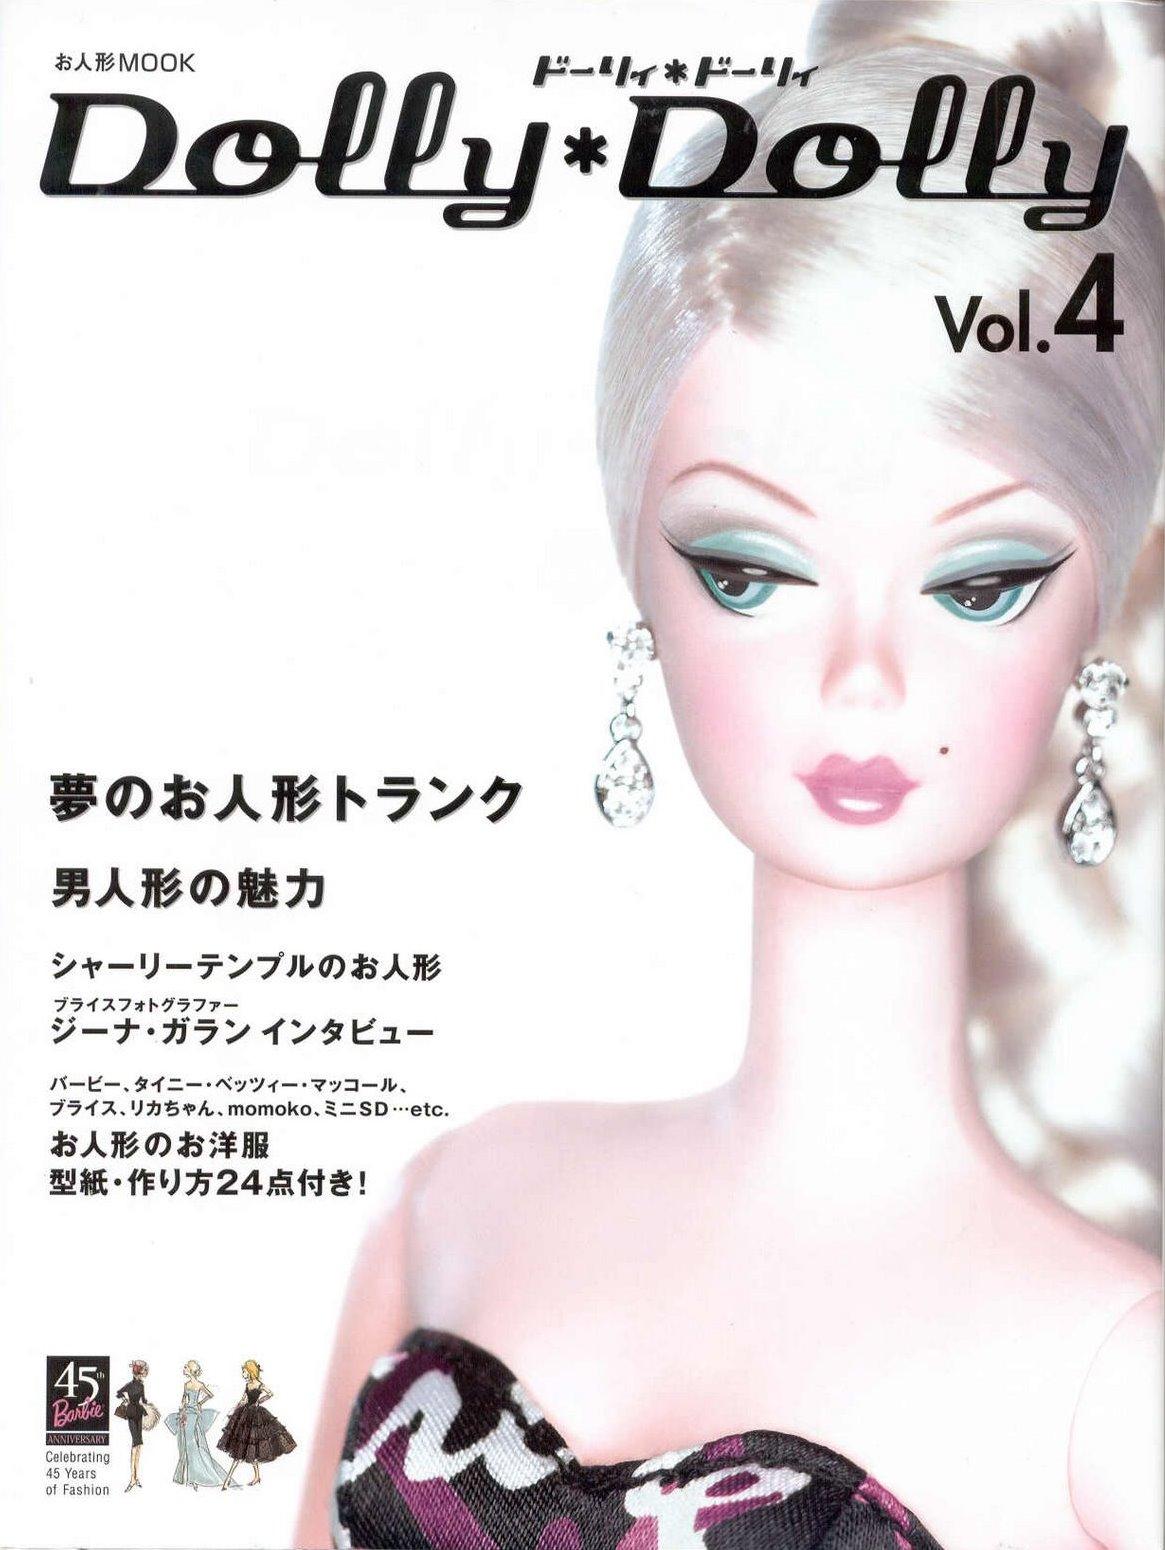 Dolly*Dolly Barbie vol 4- Revista Moldes De Roupas Para Bonecas